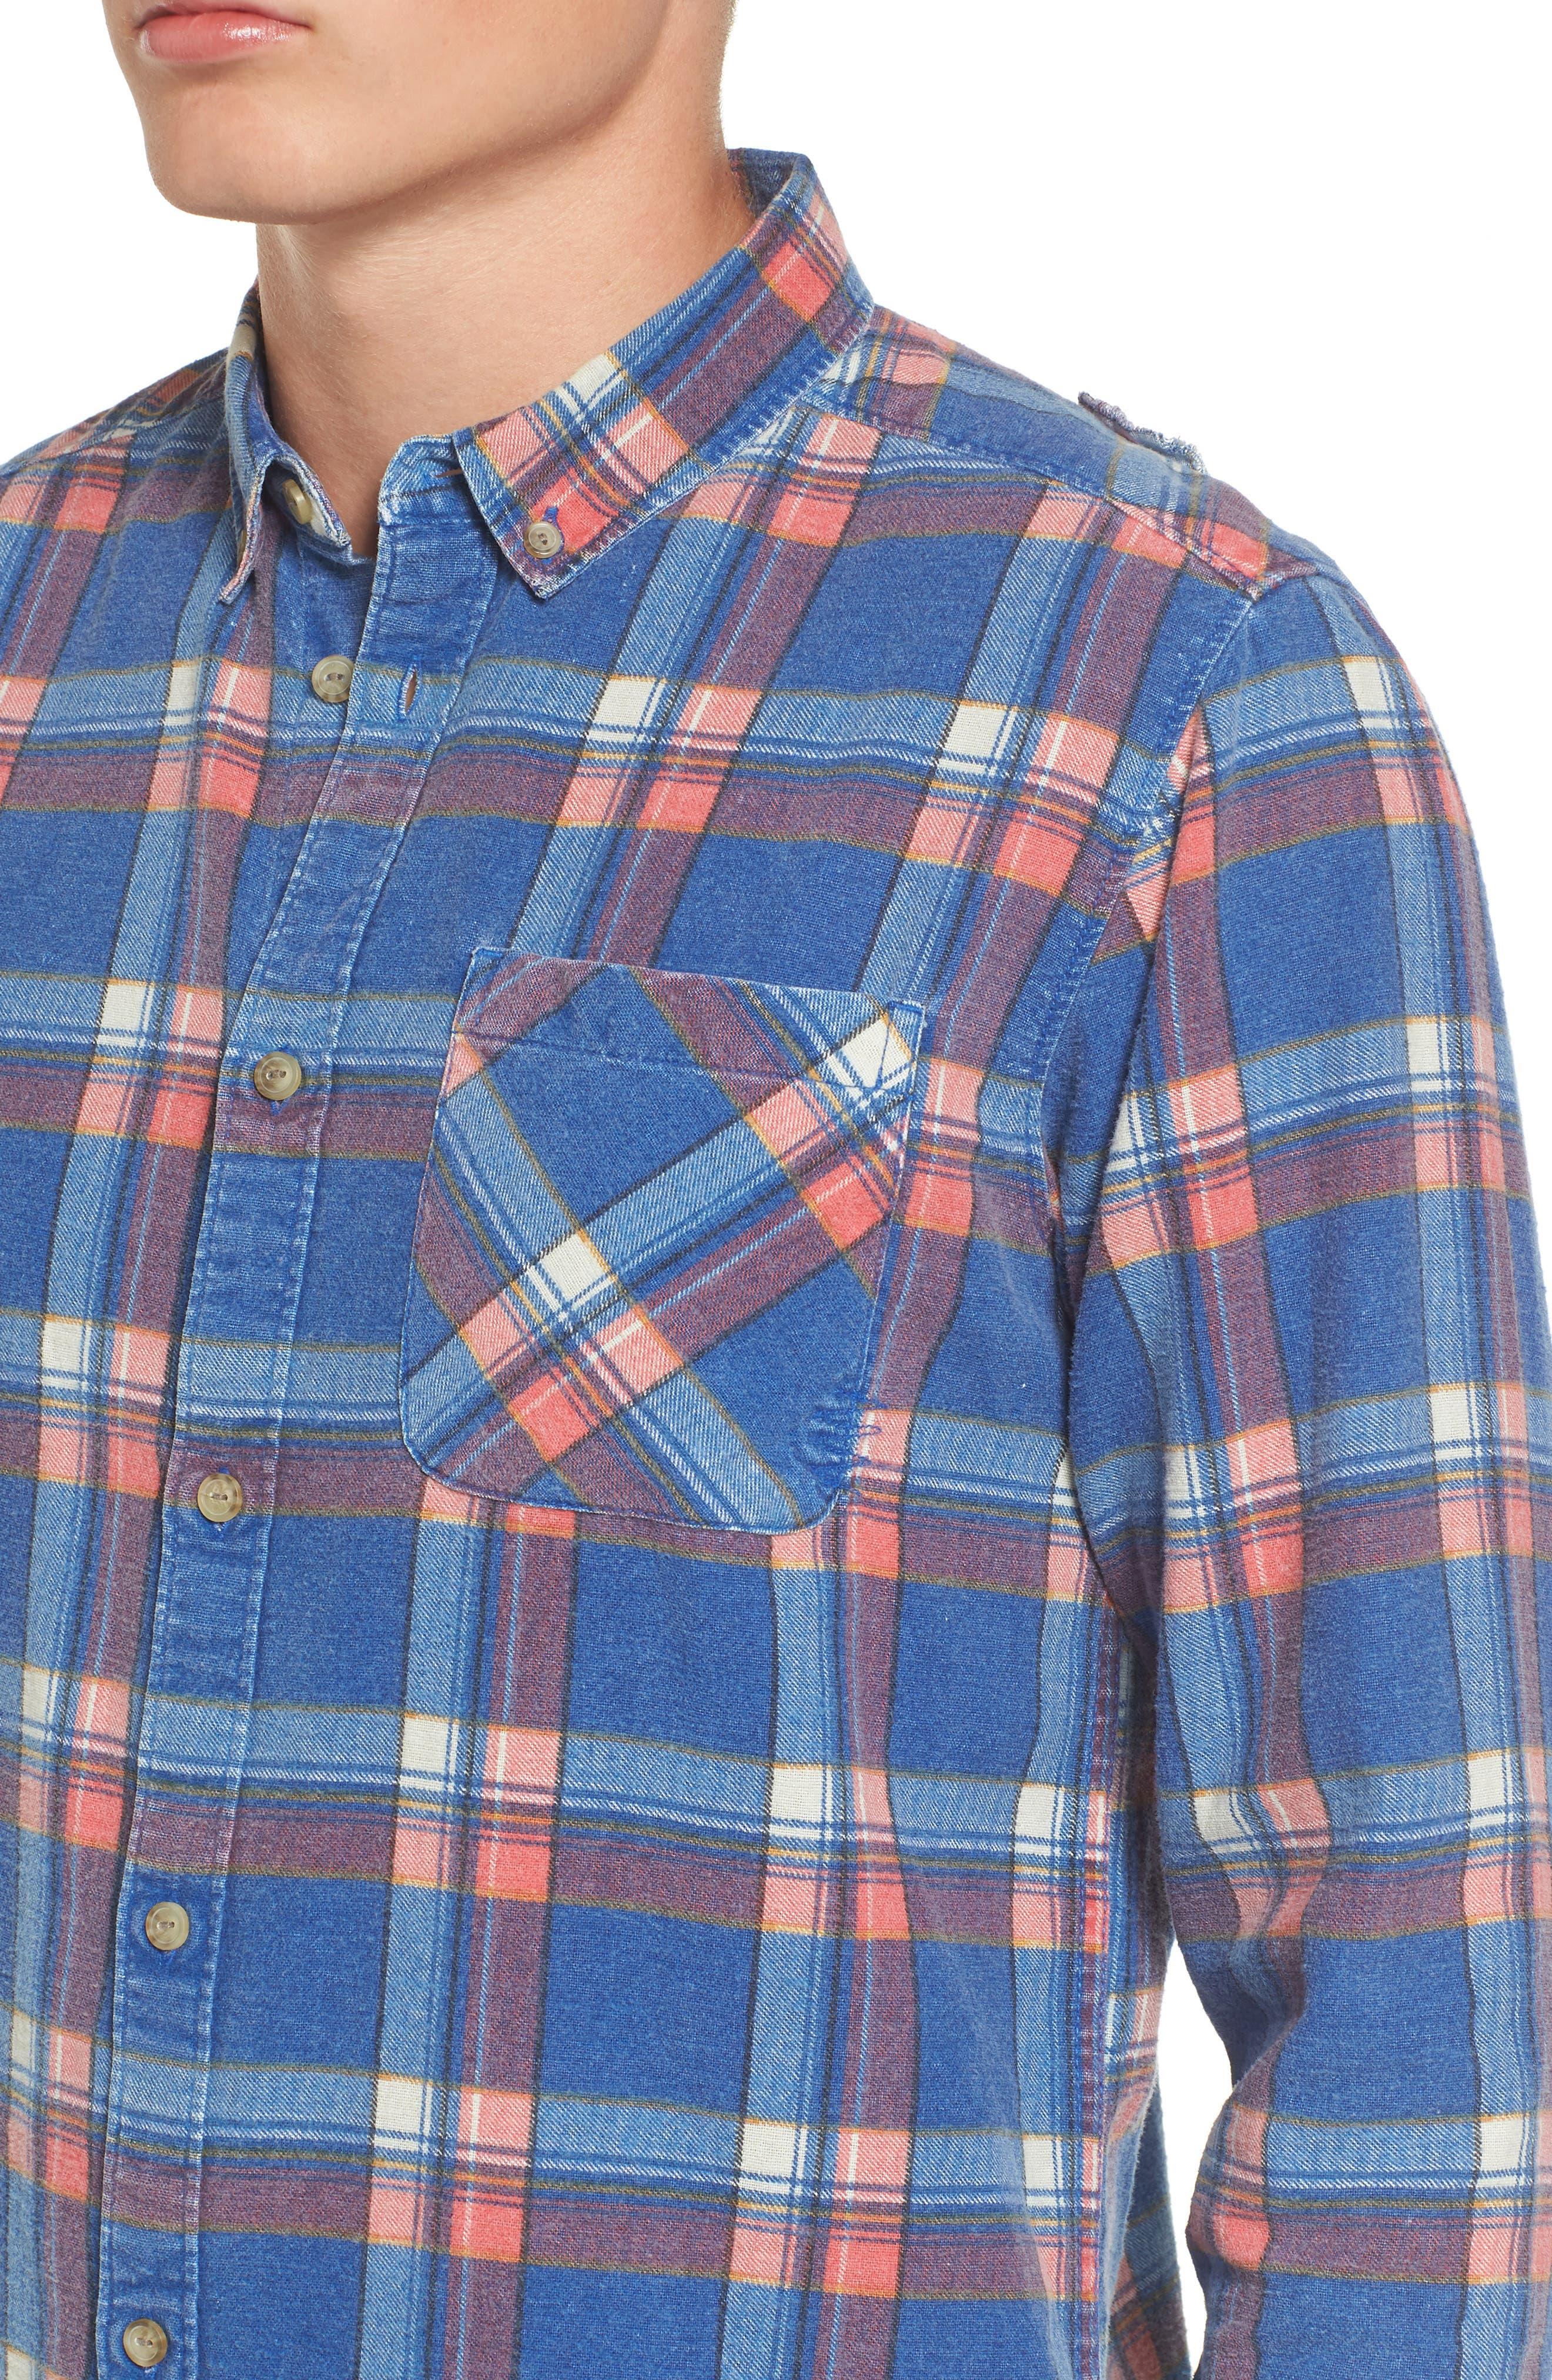 x Kevin Long Plaid Shirt,                             Alternate thumbnail 4, color,                             462